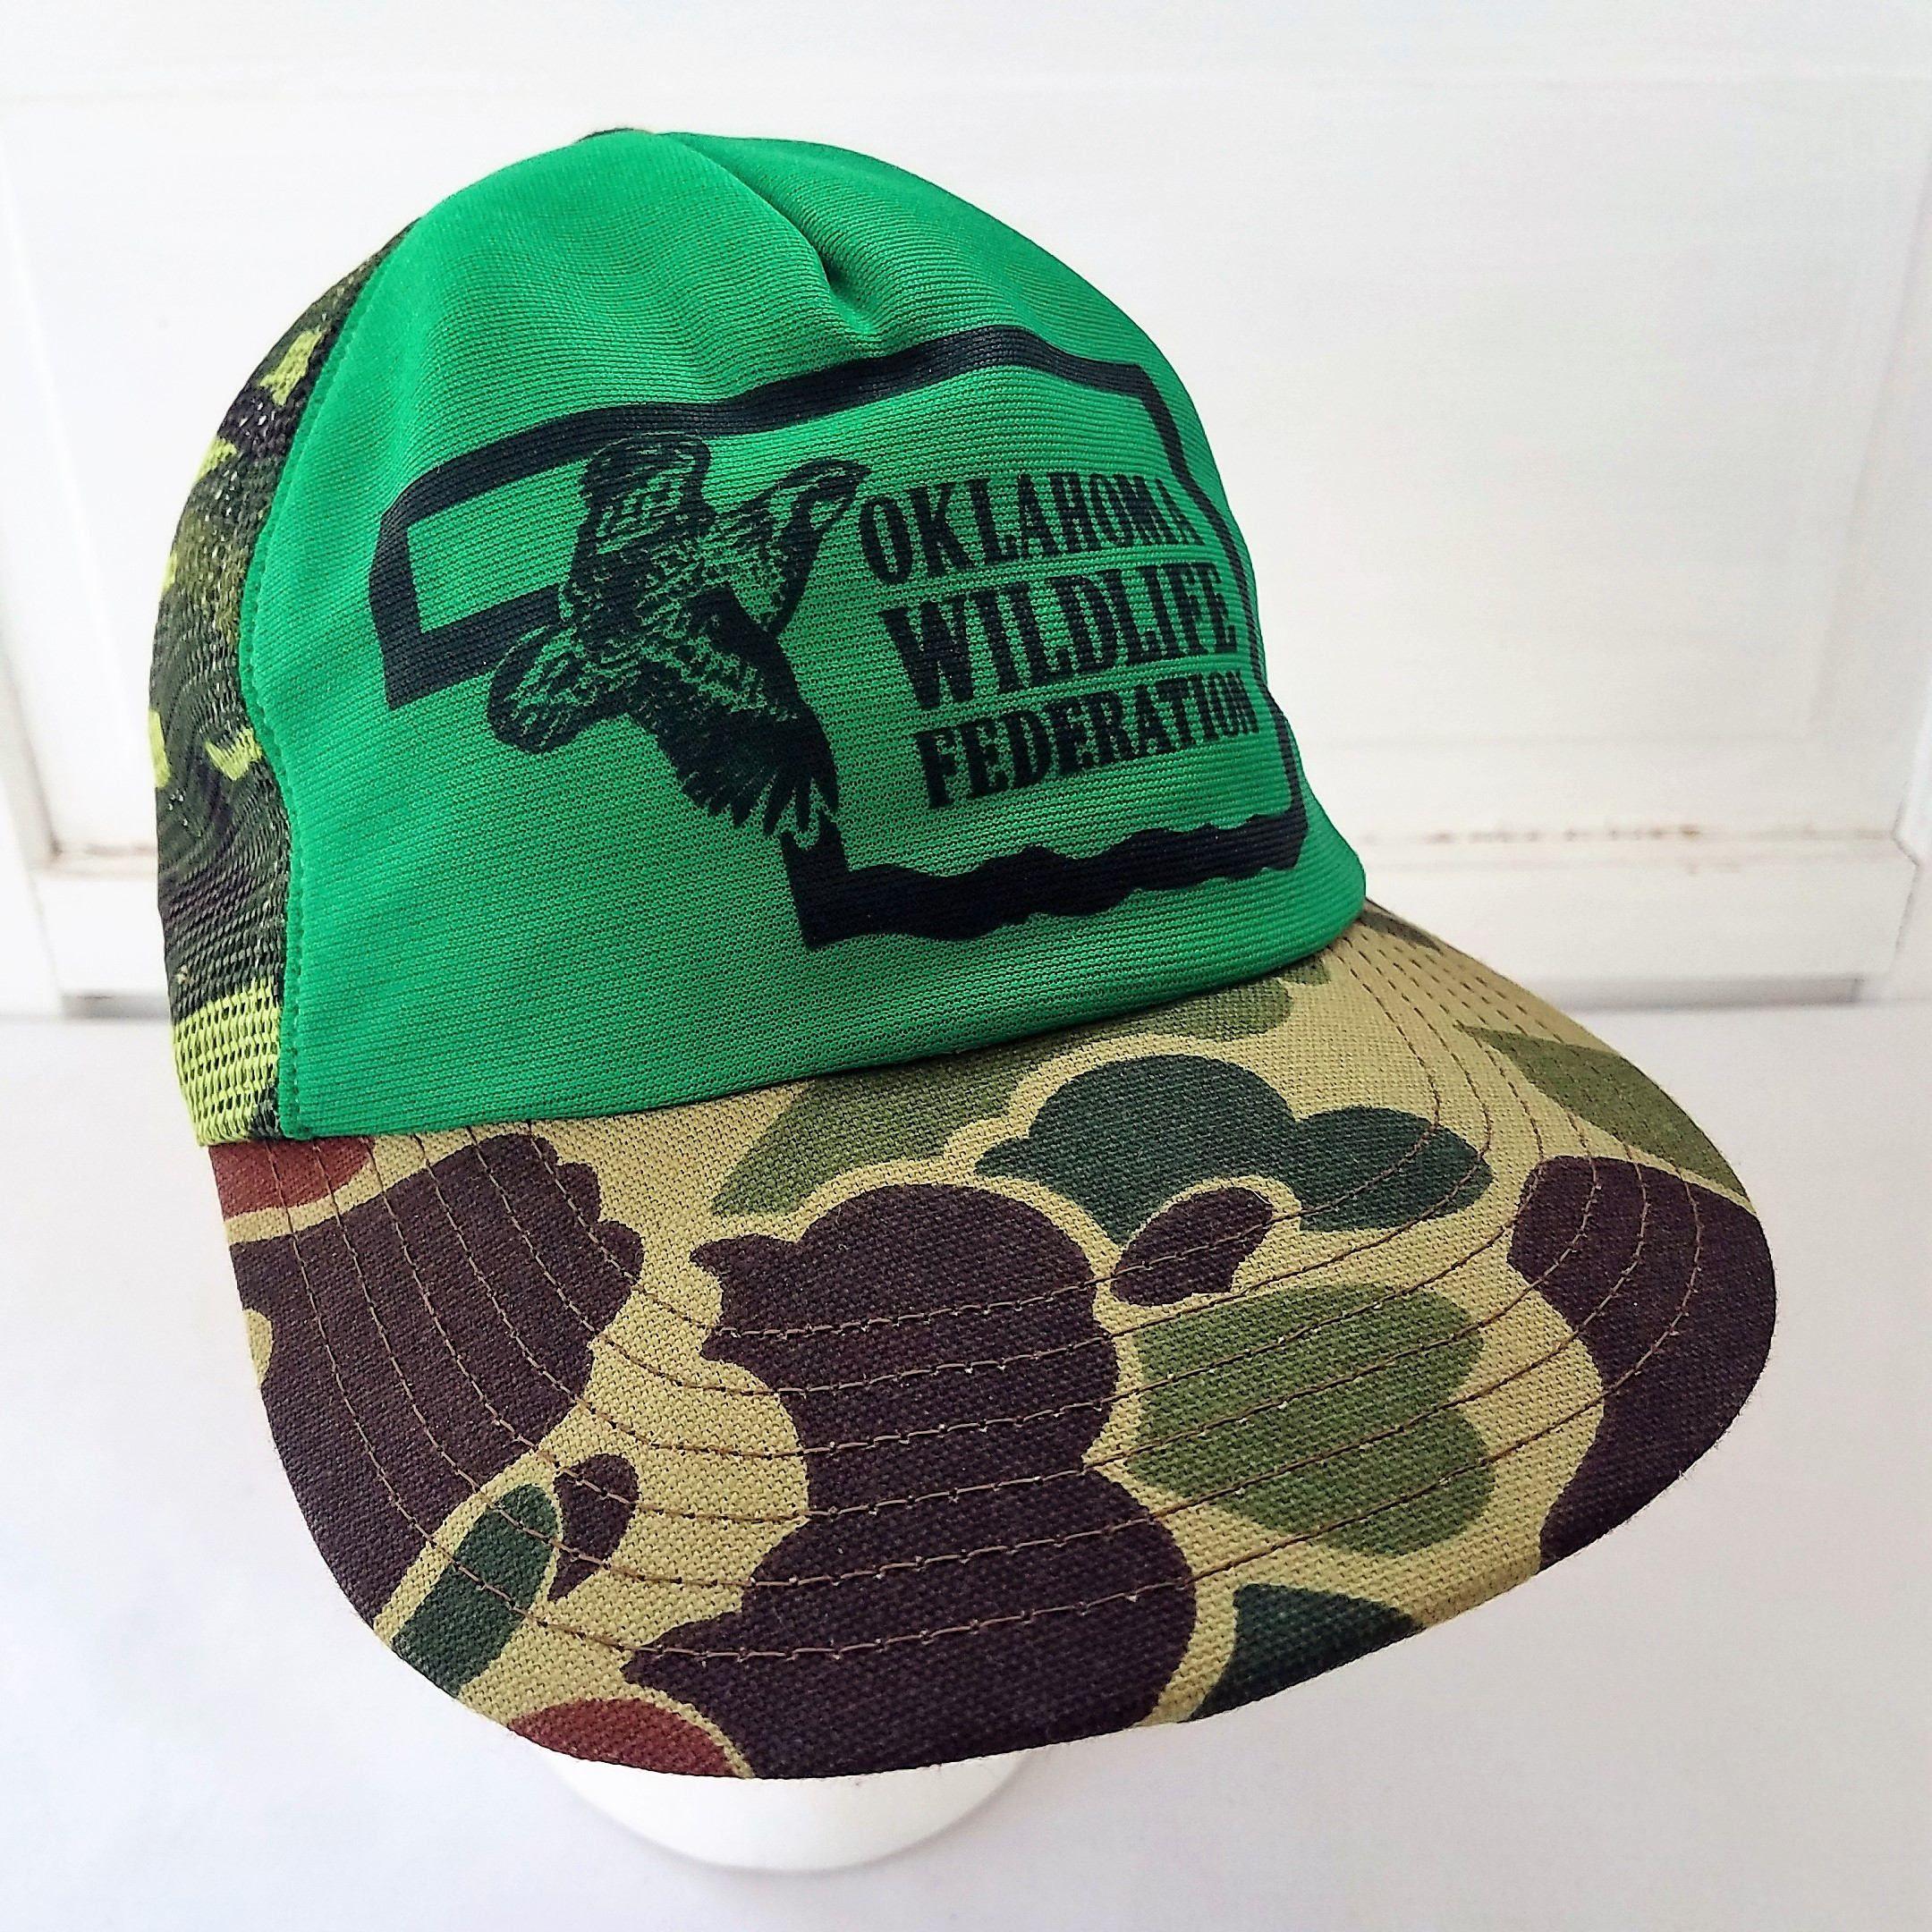 4e7df7be4a81b Oklahoma Wildlife Federation Camo Trucker Snapback Hat Cap Mesh Vintage  Green by TraSheeWomen on Etsy  oklahomawildlifefederation  oklahoma   wildlife ...